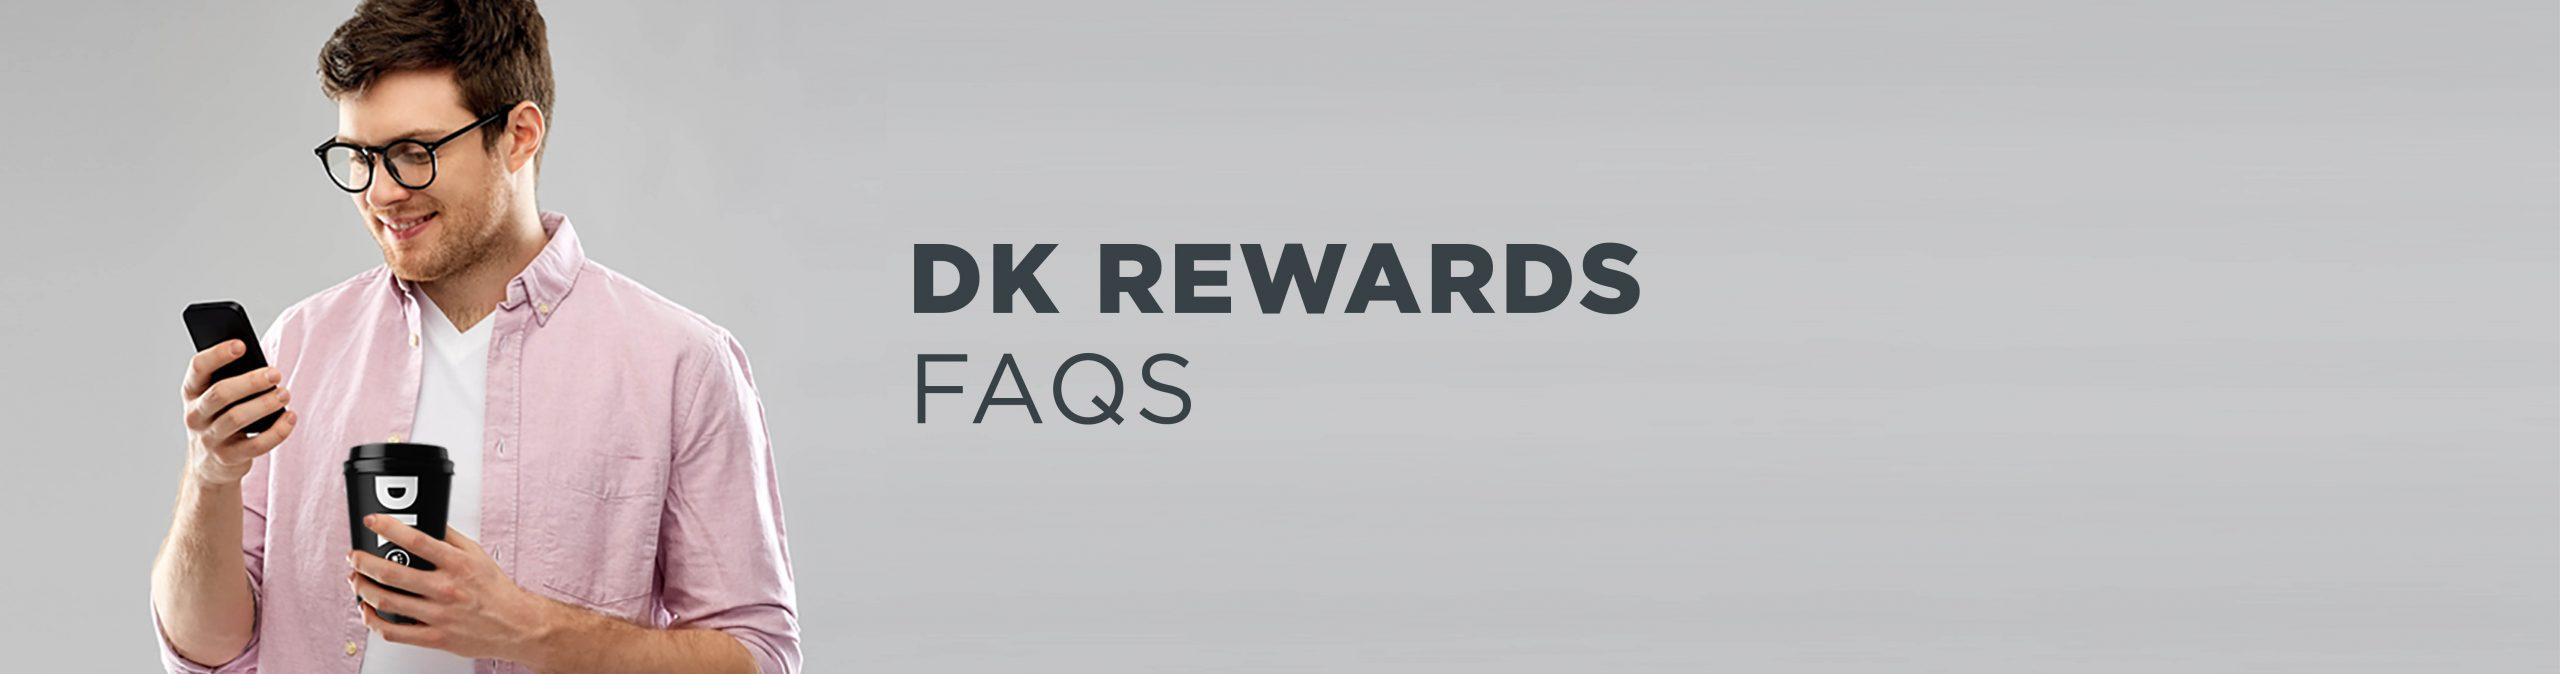 dk4212-dk-rewards-website-home-page-slider-1900x500px2